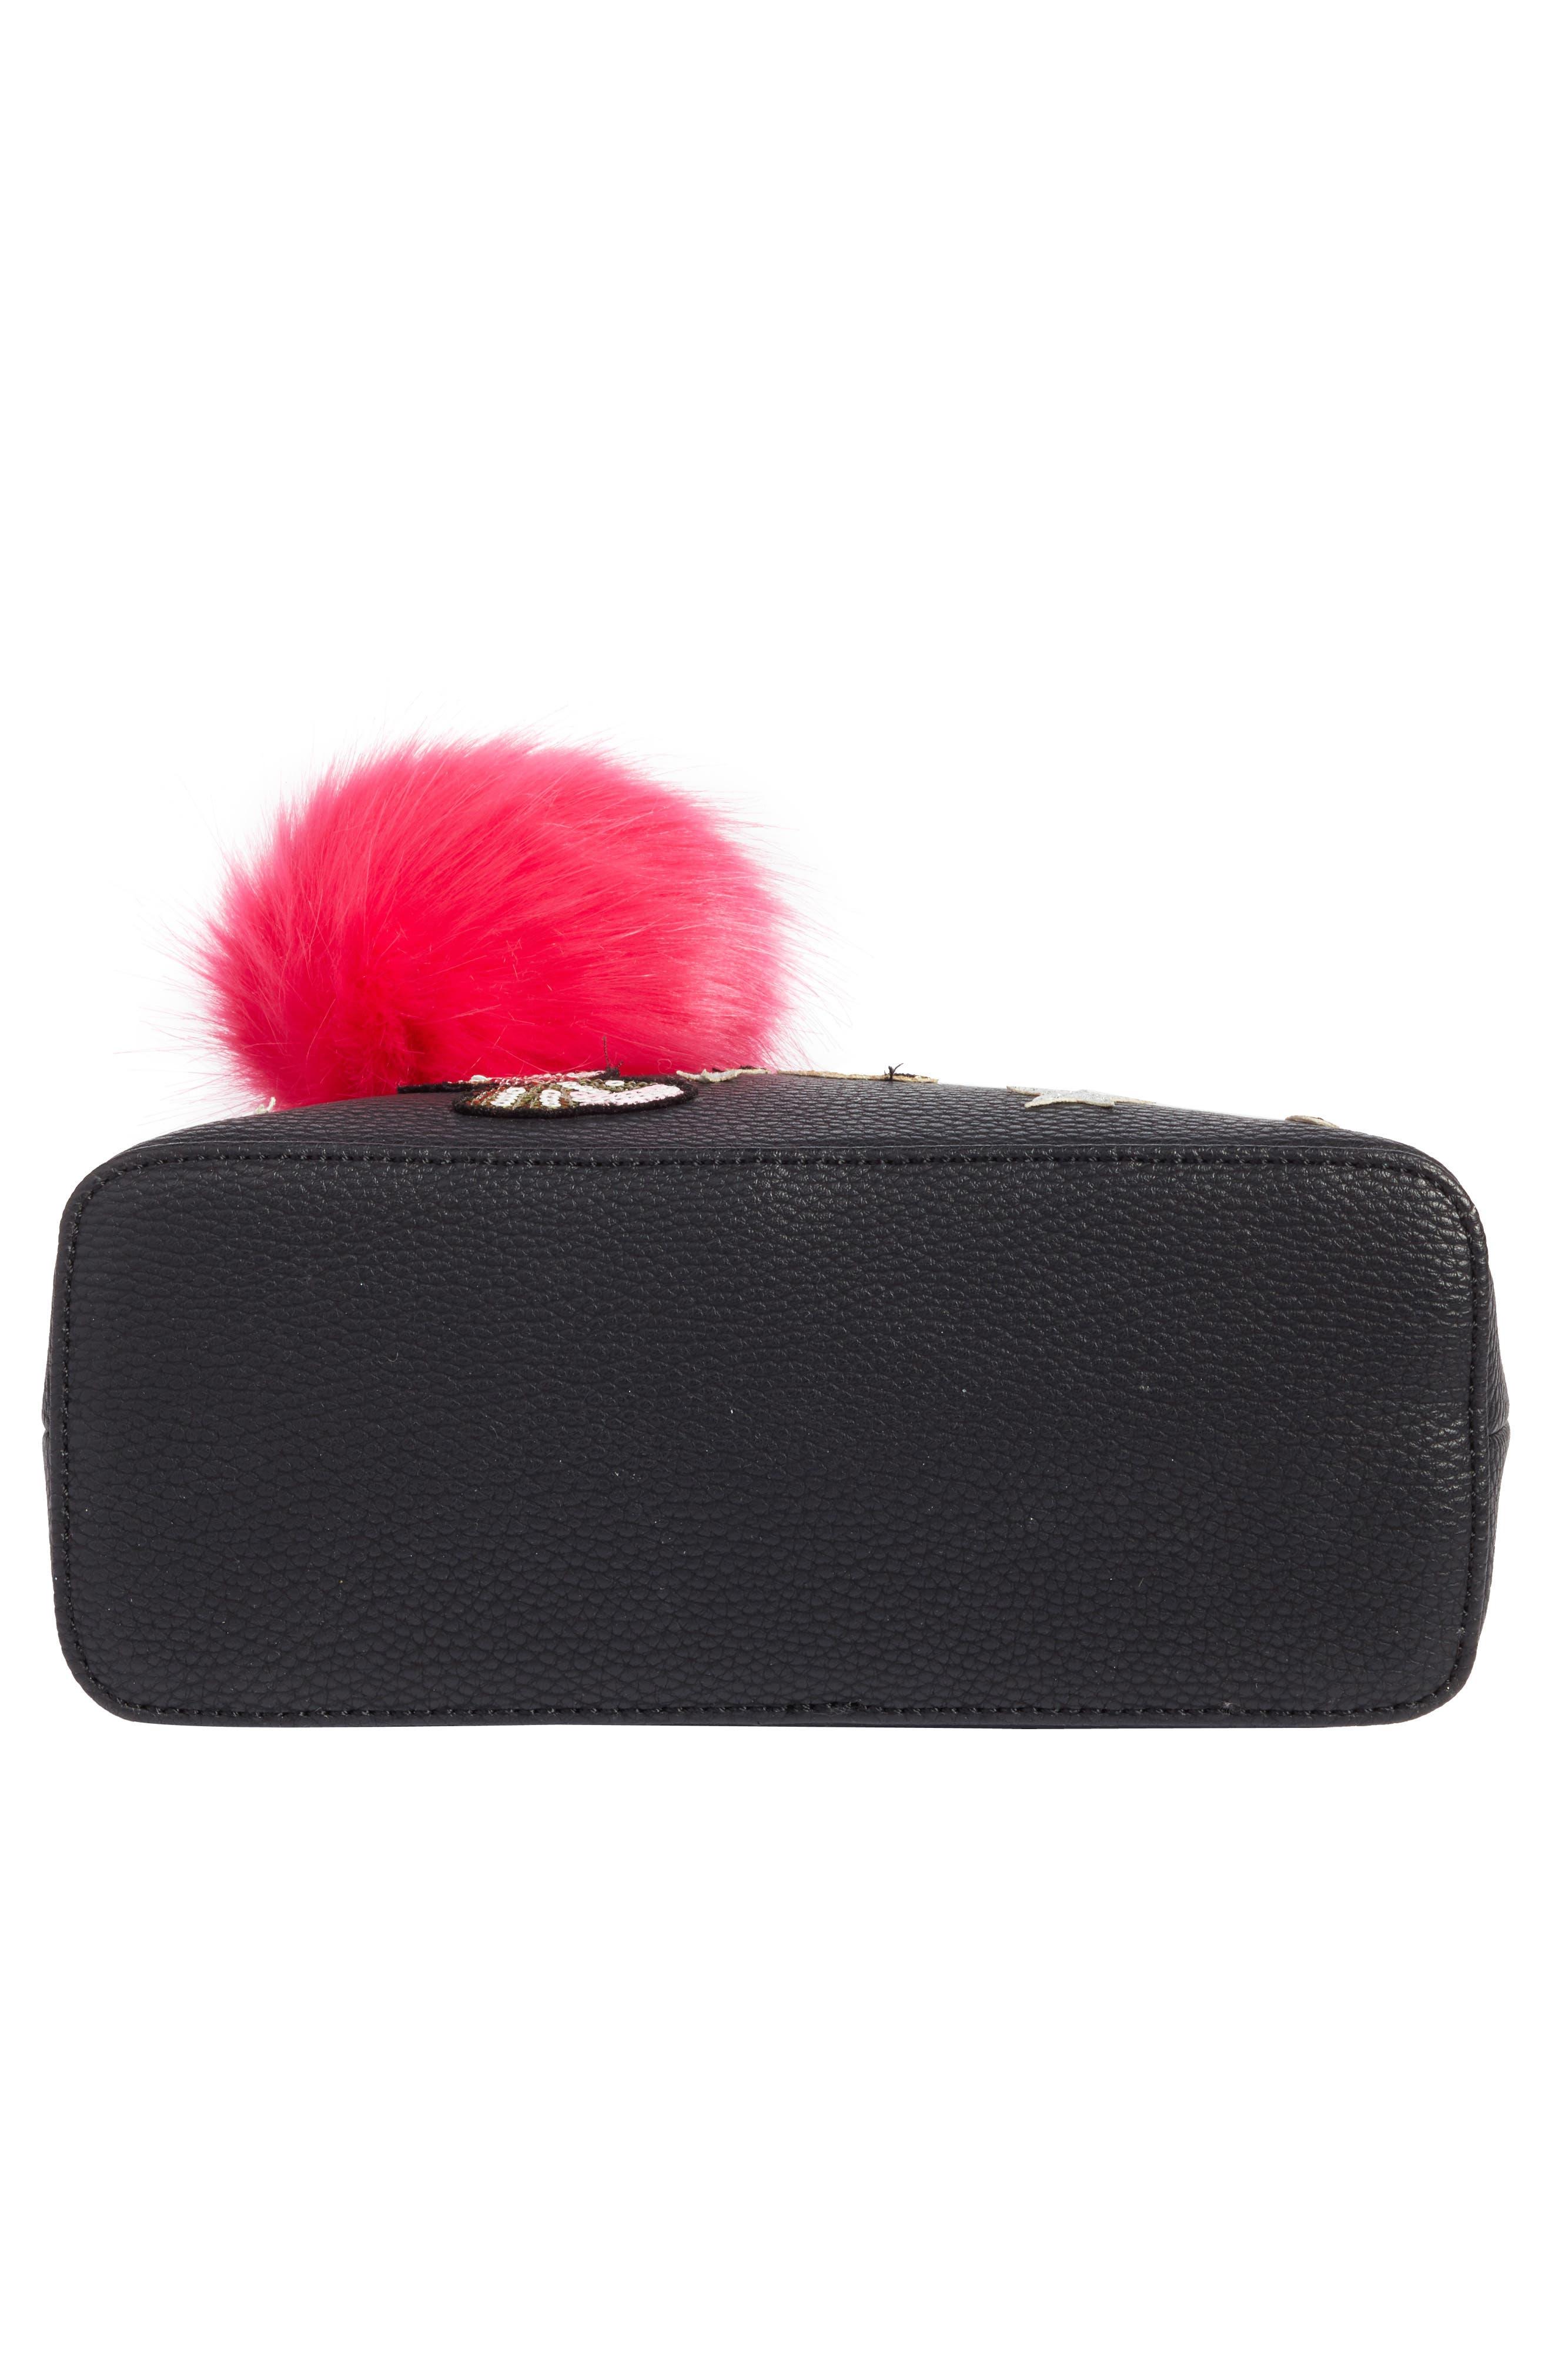 Appliqué Handbag,                             Alternate thumbnail 5, color,                             006